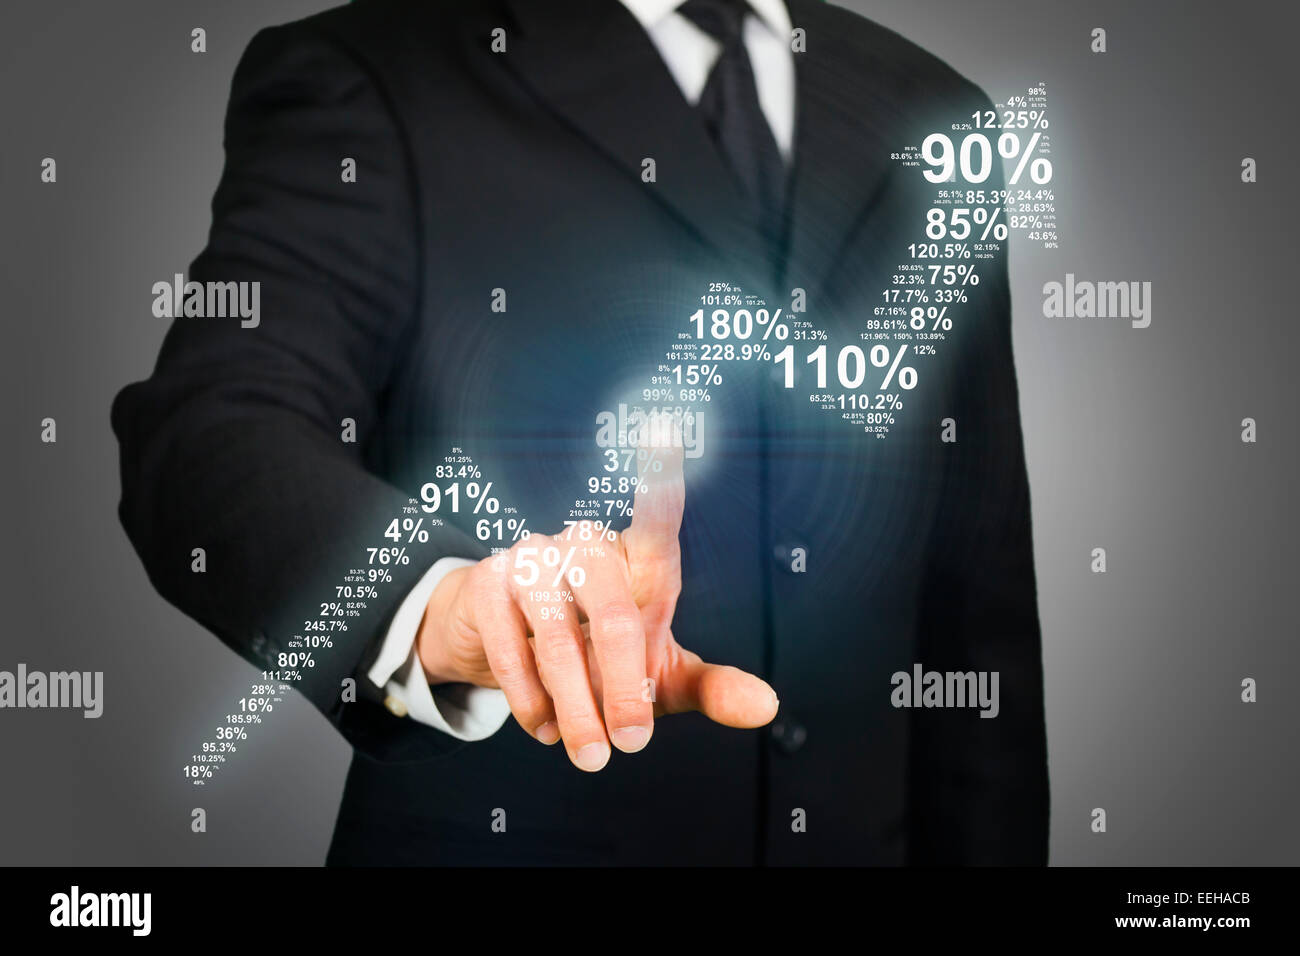 Business improvement - Stock Image